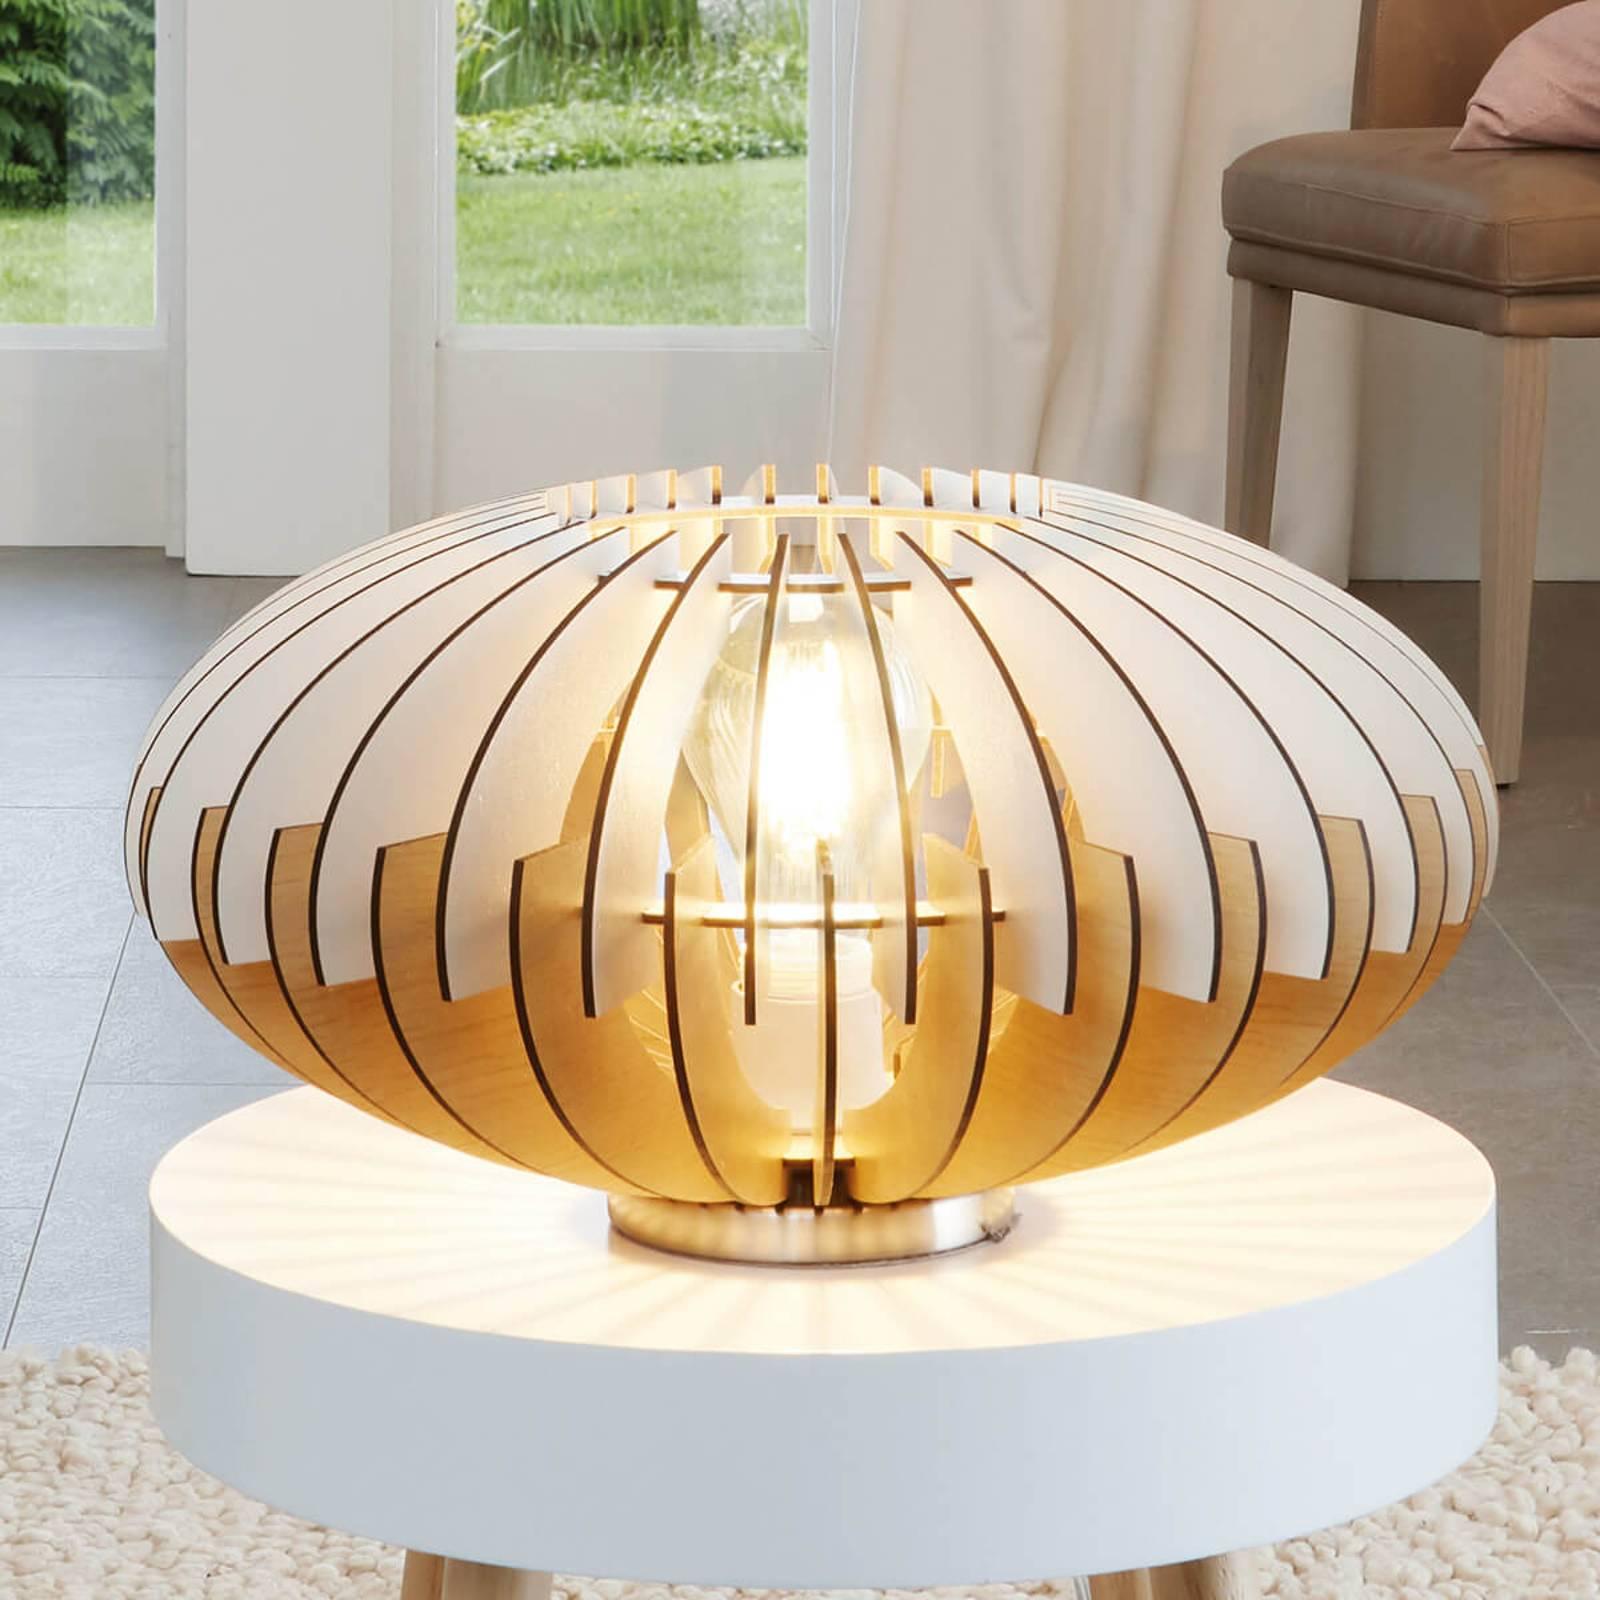 Decoratieve tafellamp Sotos van hout